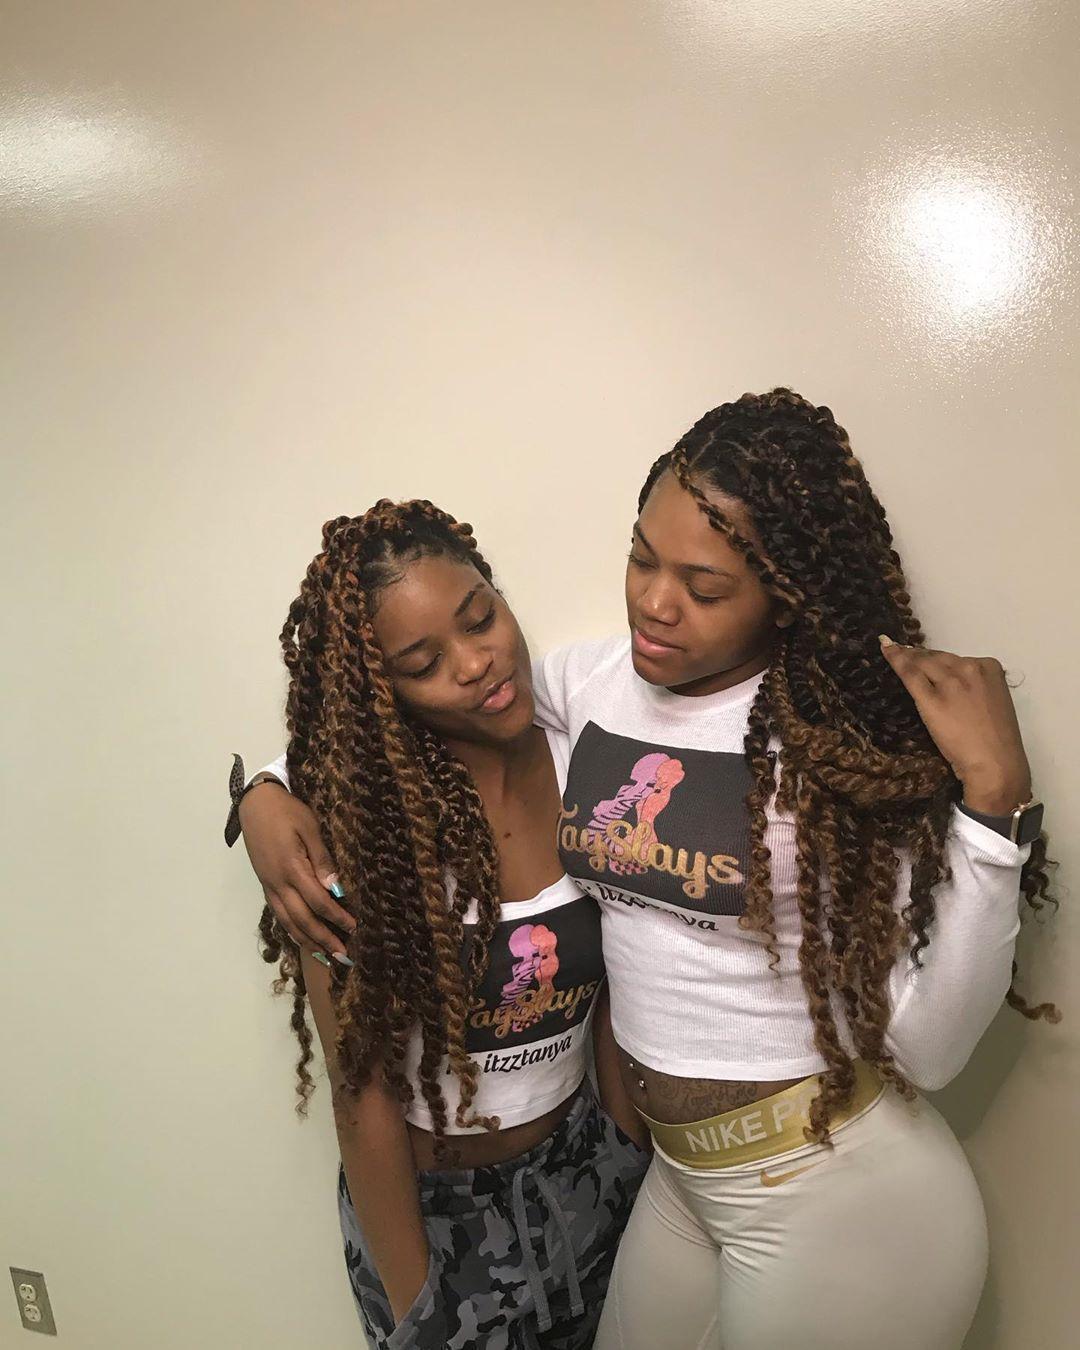 Beautiful ladies bodying my passion twists while rocking #TaySlays tops!  #passiontwist #boxbraids #protectivestyles #fauxlocs #braids #knotlessbraids #goddesslocs #queensstylist #marleytwist #feedinbraids #lemonadebraids #passiontwists #explorepage #braidstyles #hairstyles #crochetbraids #goddessbraids #naturalhairstyles #knotlessboxbraids #springtwist #tribalbraids #dmvbraider #longbraids #queensbraider #neatbraids #crochetfauxlocs #senegalesetwist #longislandstylist #tayslays #passiontwistsha #passiontwistshairstylelong